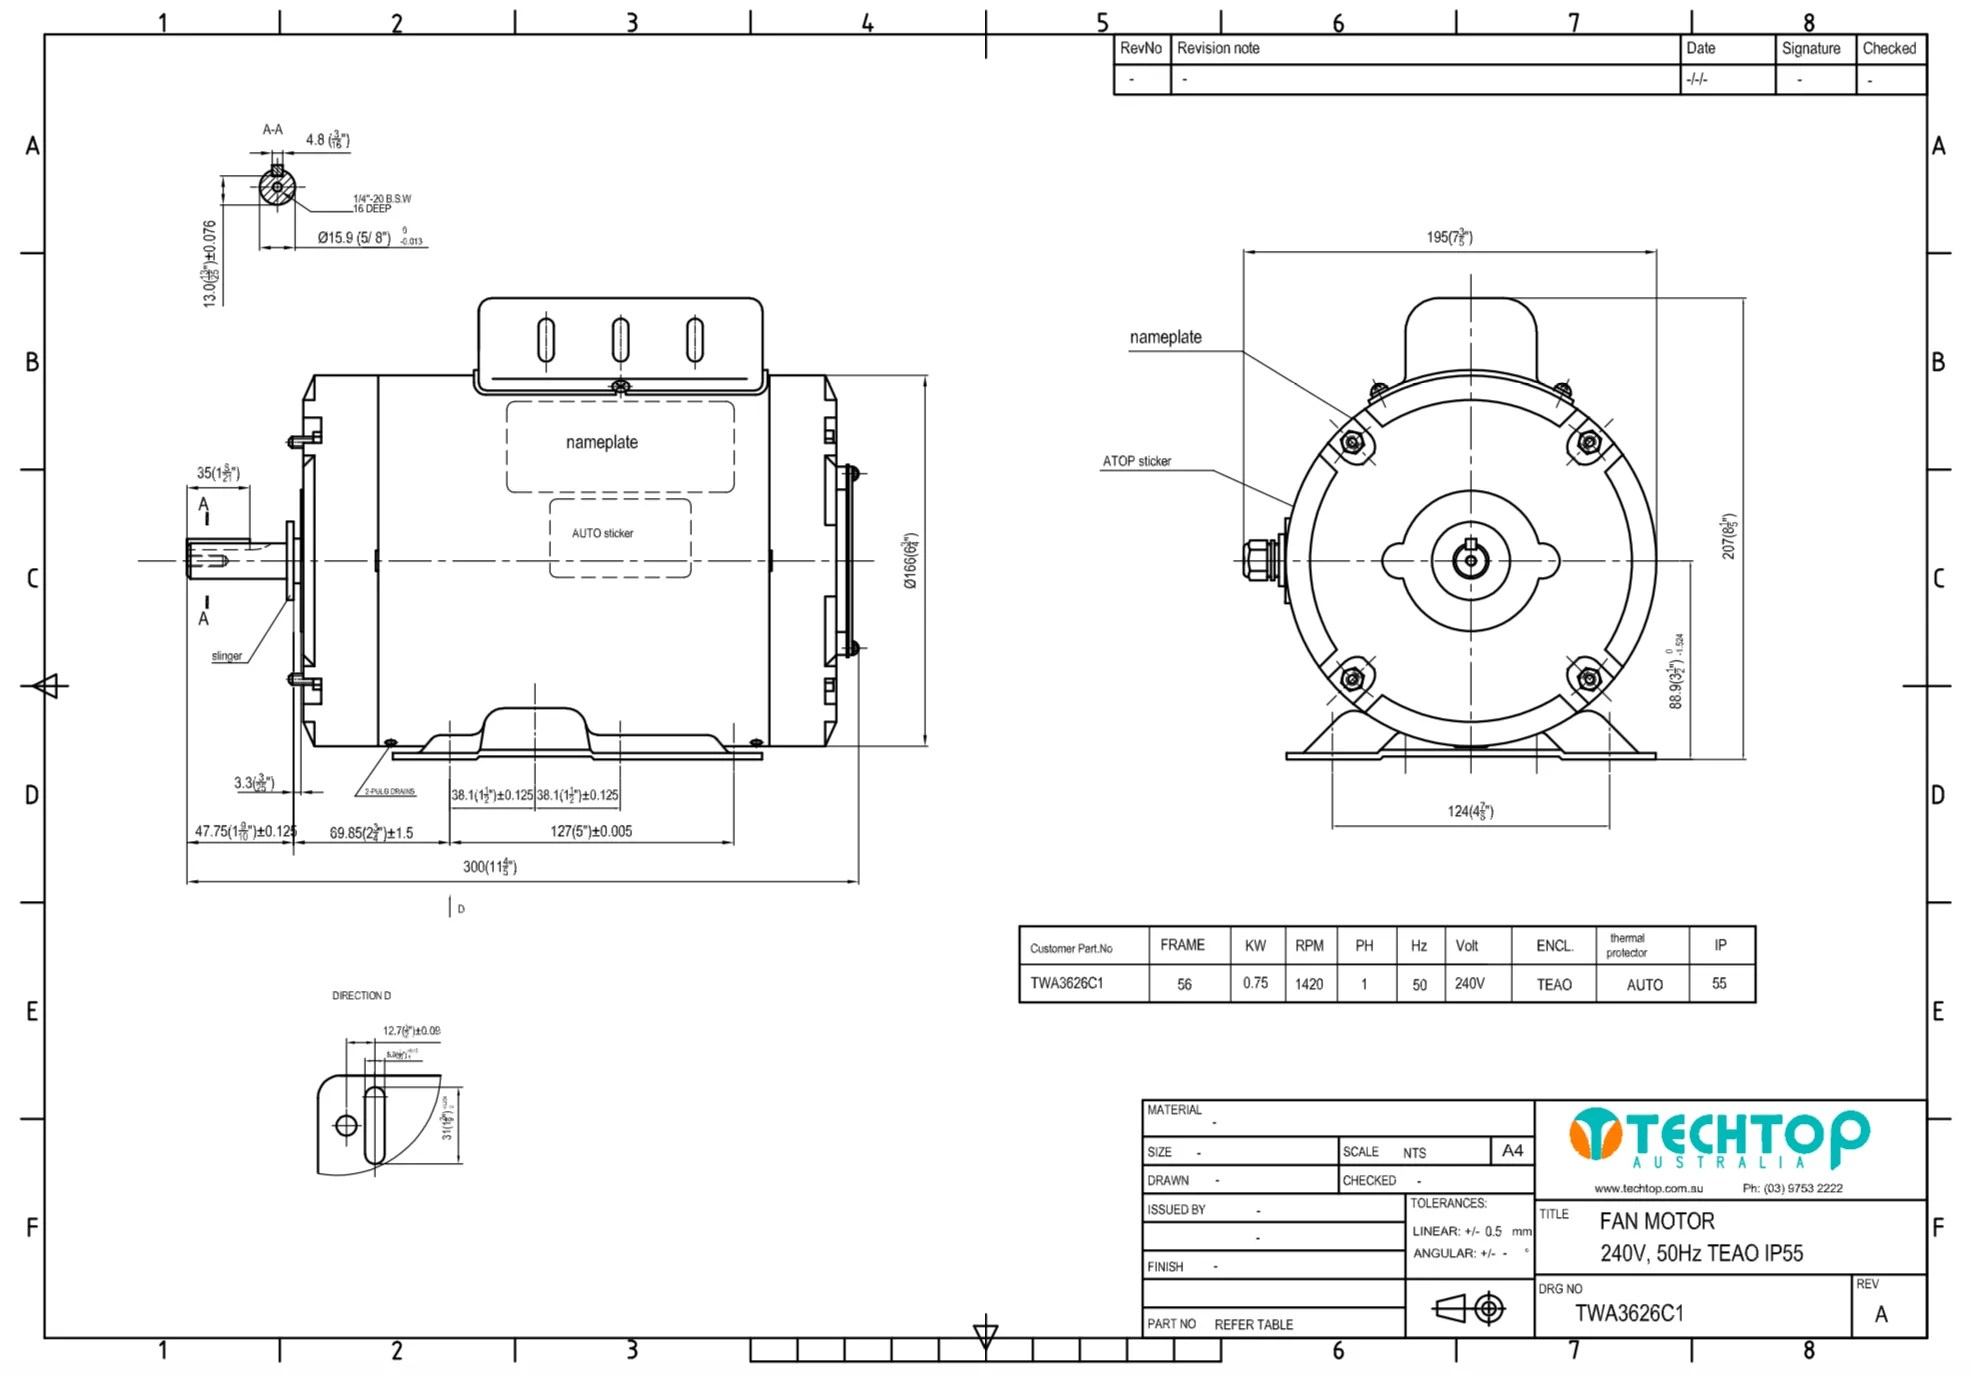 medium resolution of fan motor 0 75kw 1420rpm 240volt single phase psc 5 8 shaft teaom ip55 reversible